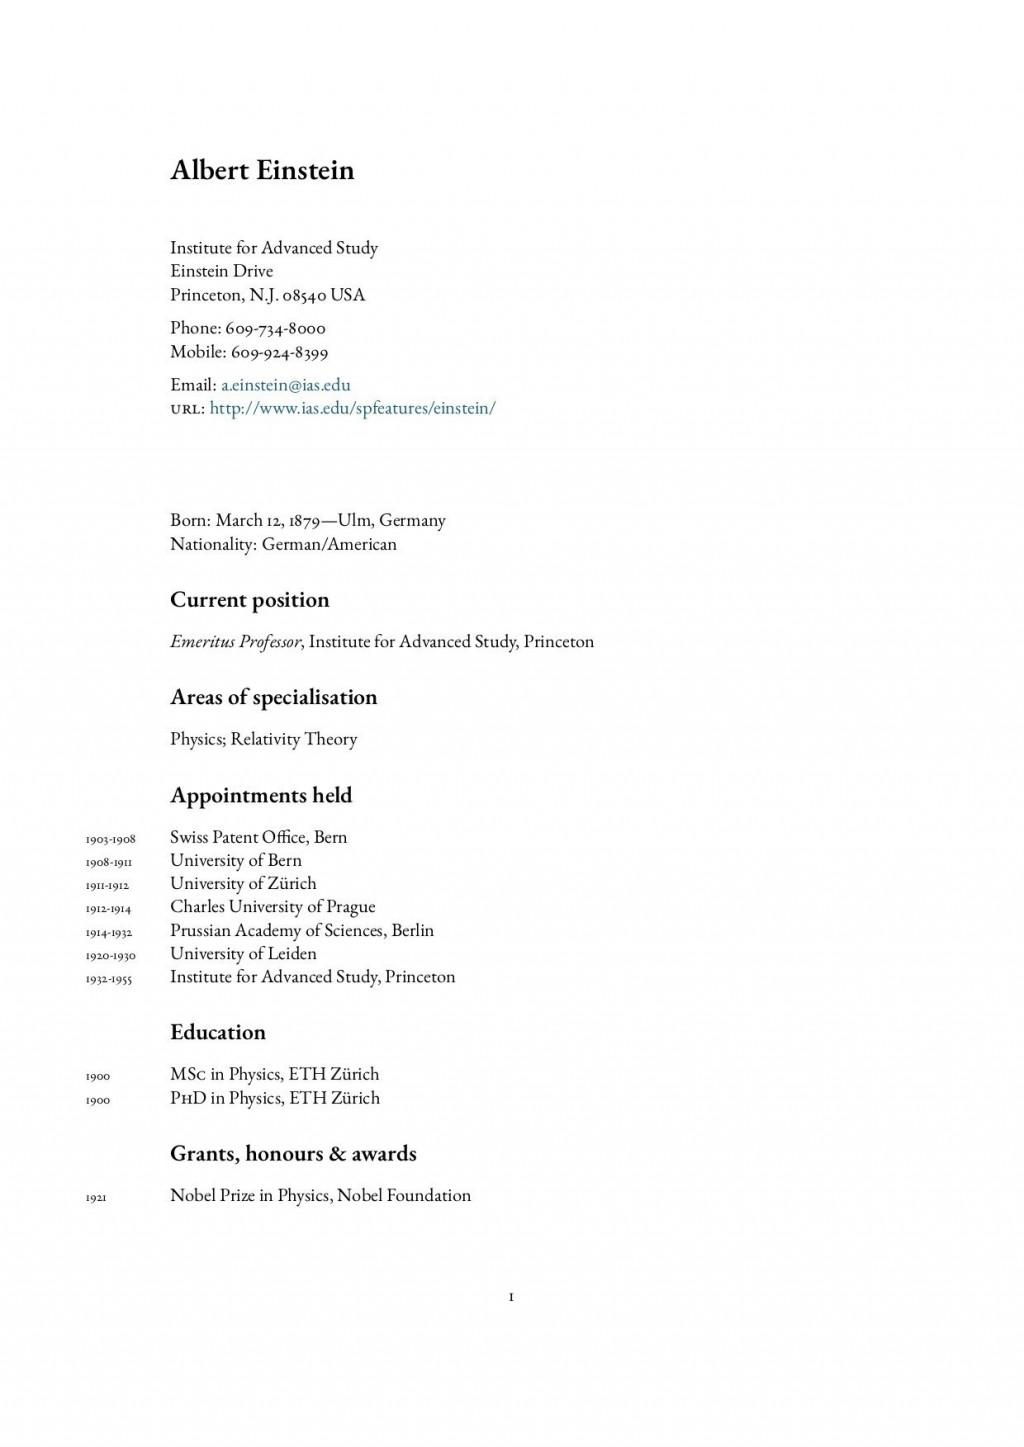 004 Best Latex Resume Template Phd High Def  Cv Graduate Student EconomicLarge